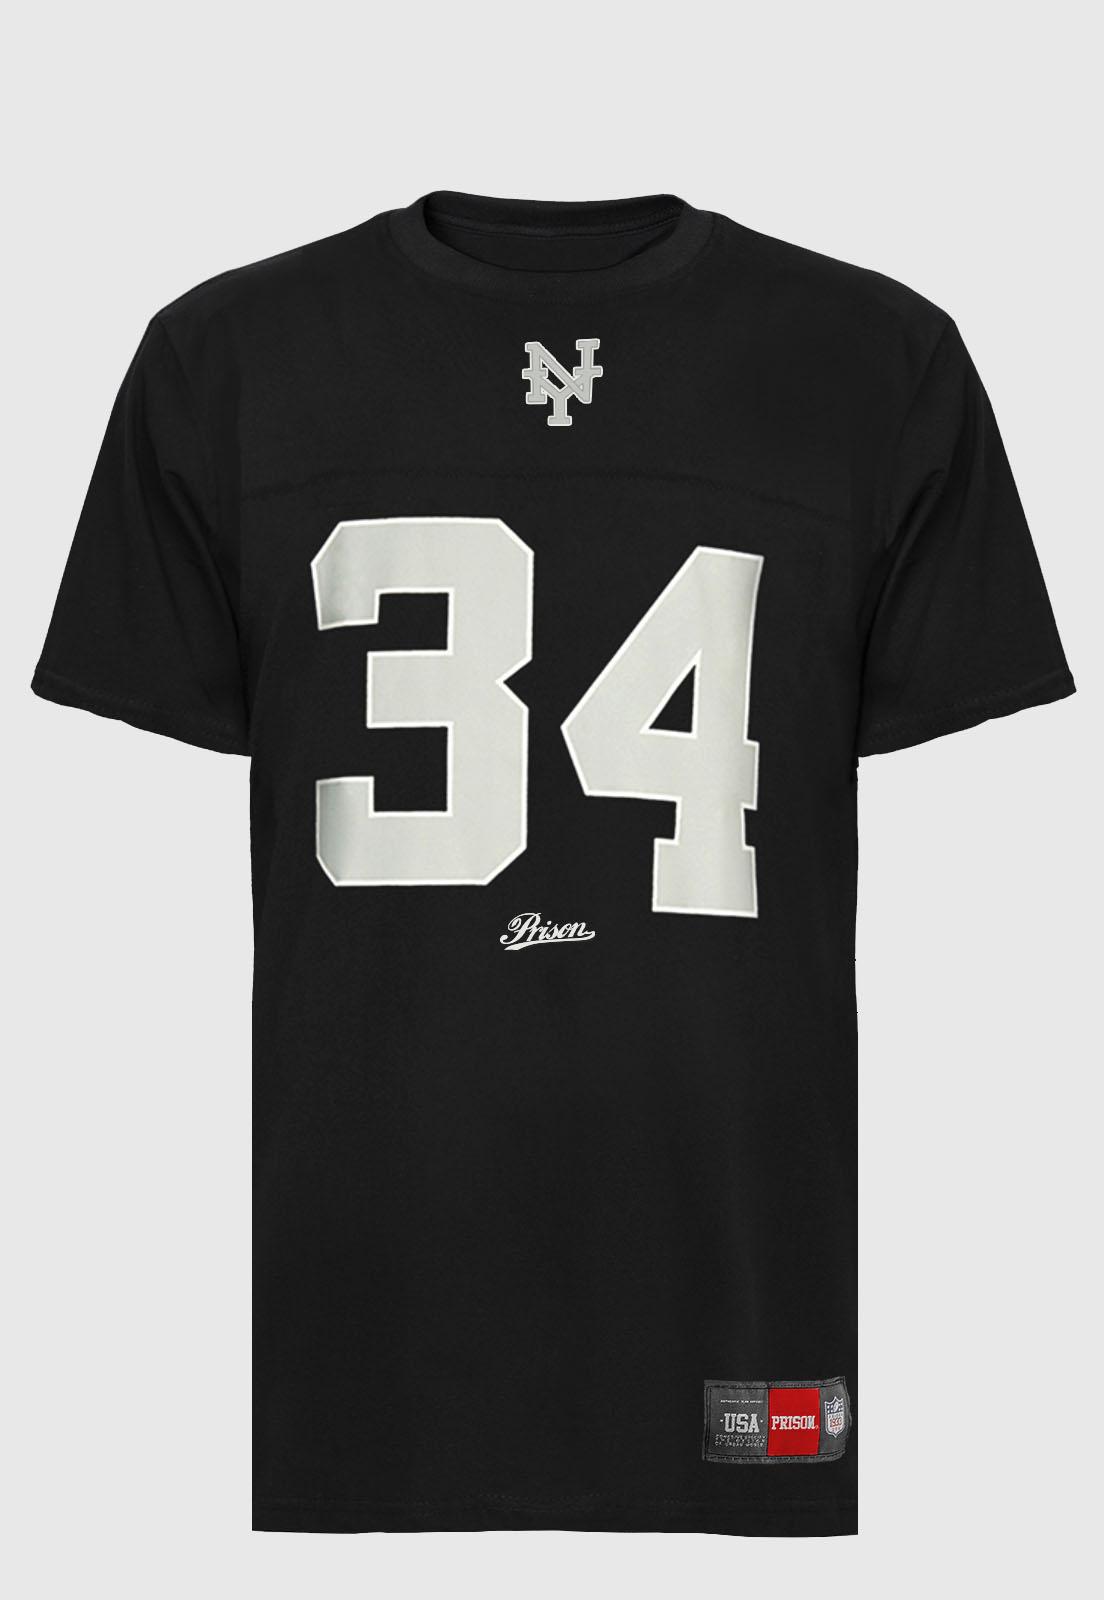 Camiseta Prison Nova York black 34